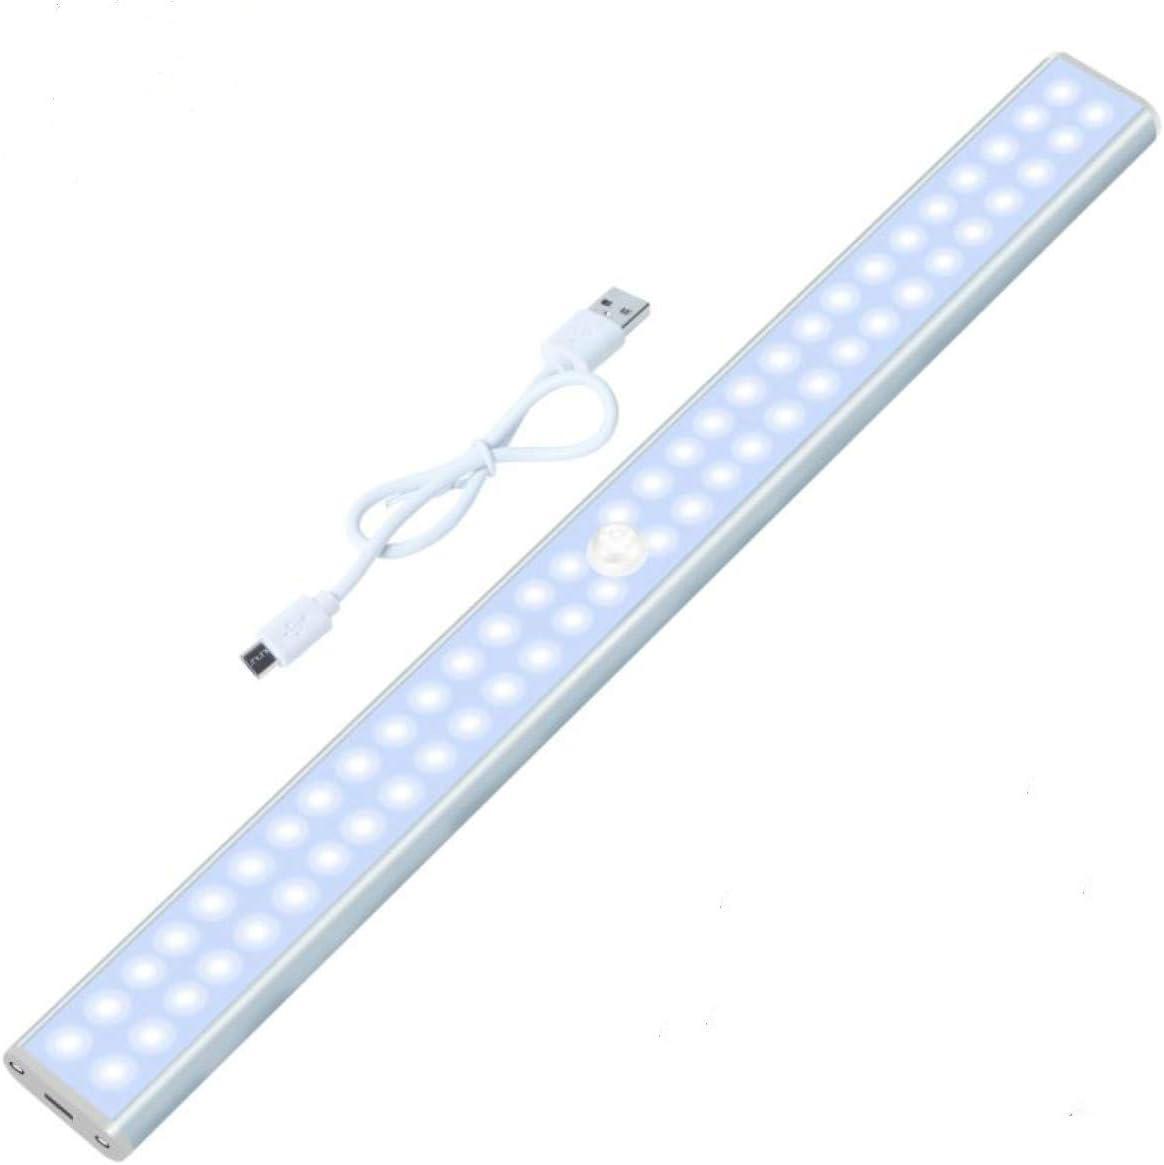 60 LED Closet Light Under Cabinet Lights Dimmable Wireless Light Bar Motion Sensor Light Battery Wall Light for Kitchen,Wardrobe,Pantry,Stairs,Bedroom, Basement,Hallway